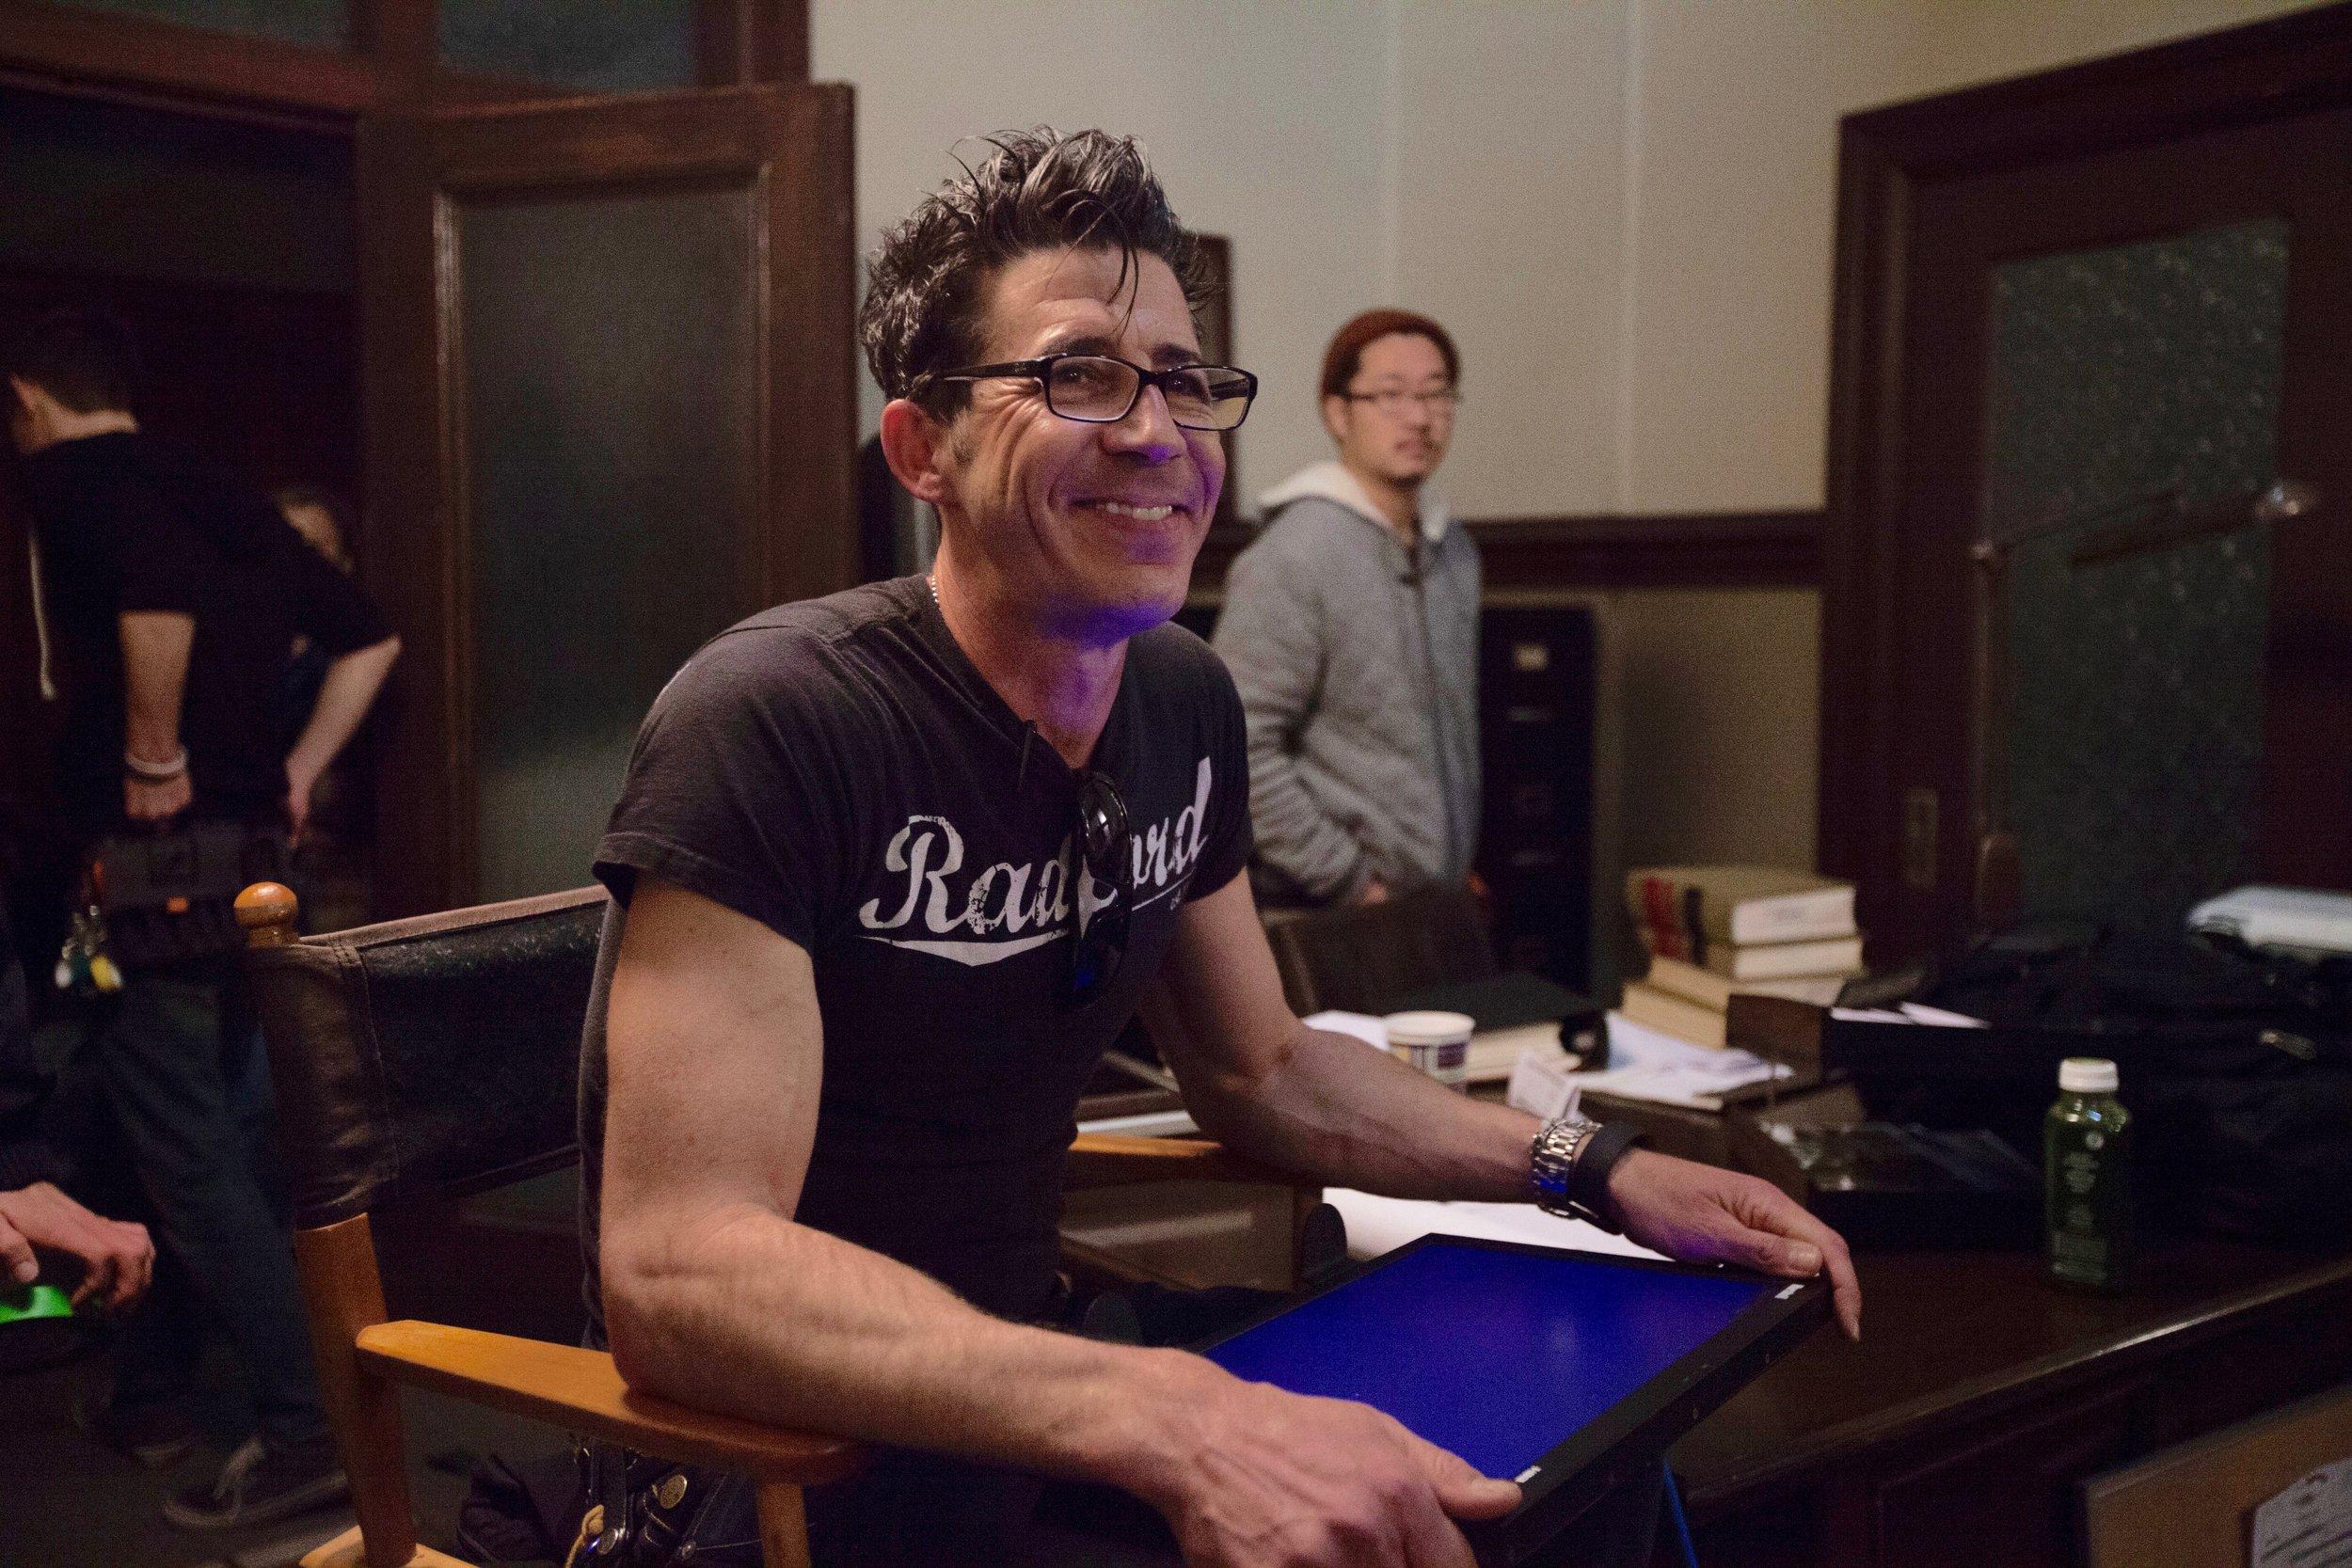 1/16/16 Cops & Bottoms Production Office Scene. L to R: Monty  Miranda (Dir.), Jae Kim (Sound)